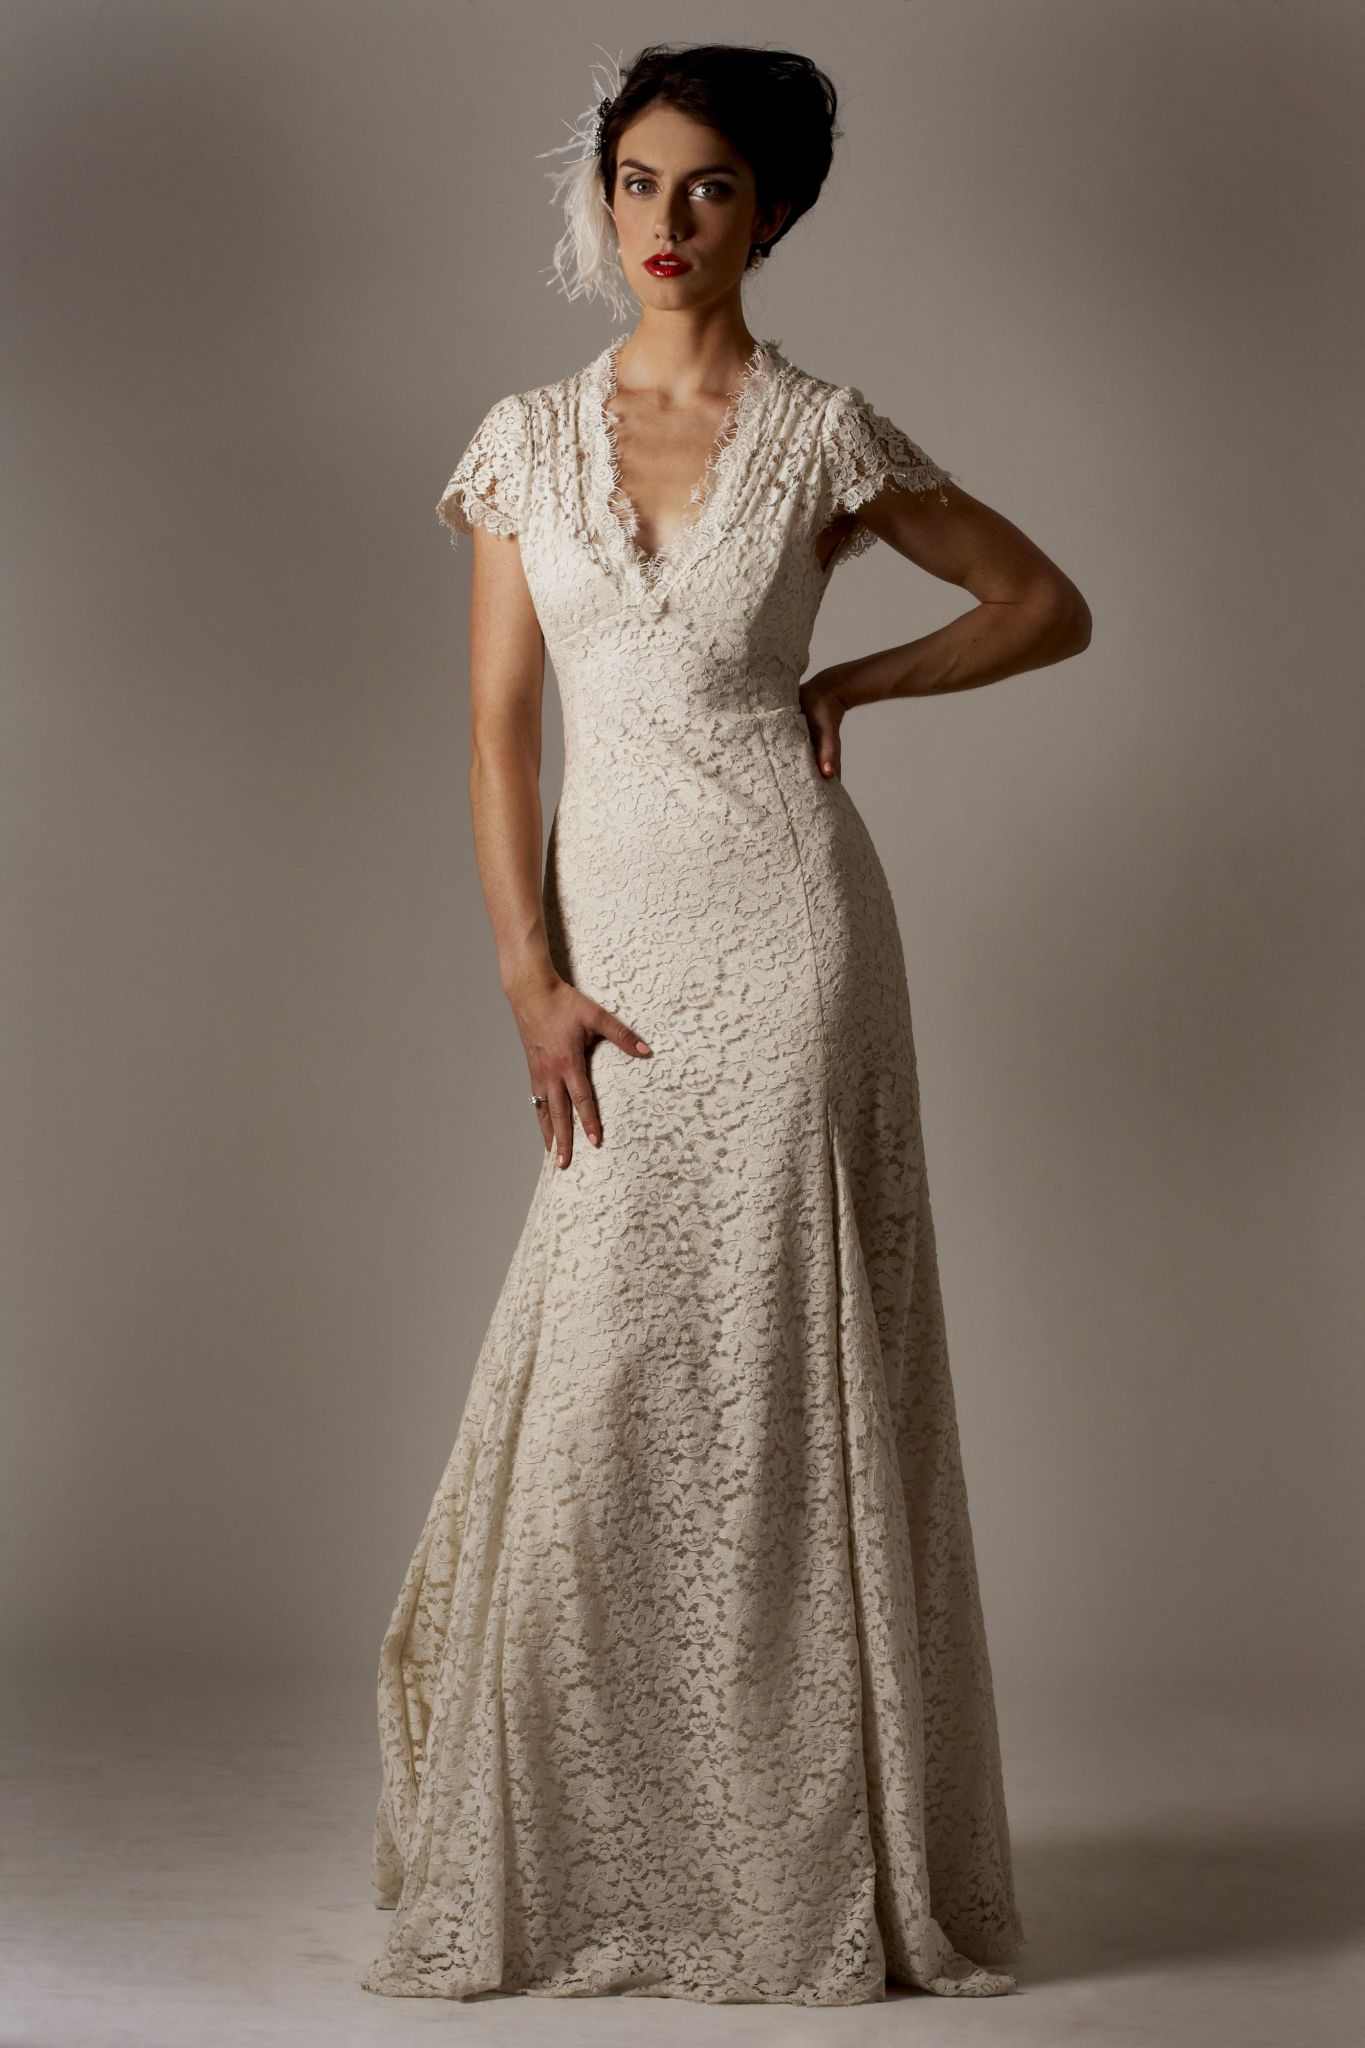 Mature bride wedding dresses  Casual Wedding Dresses for Older Brides  Wedding Dresses for Guests